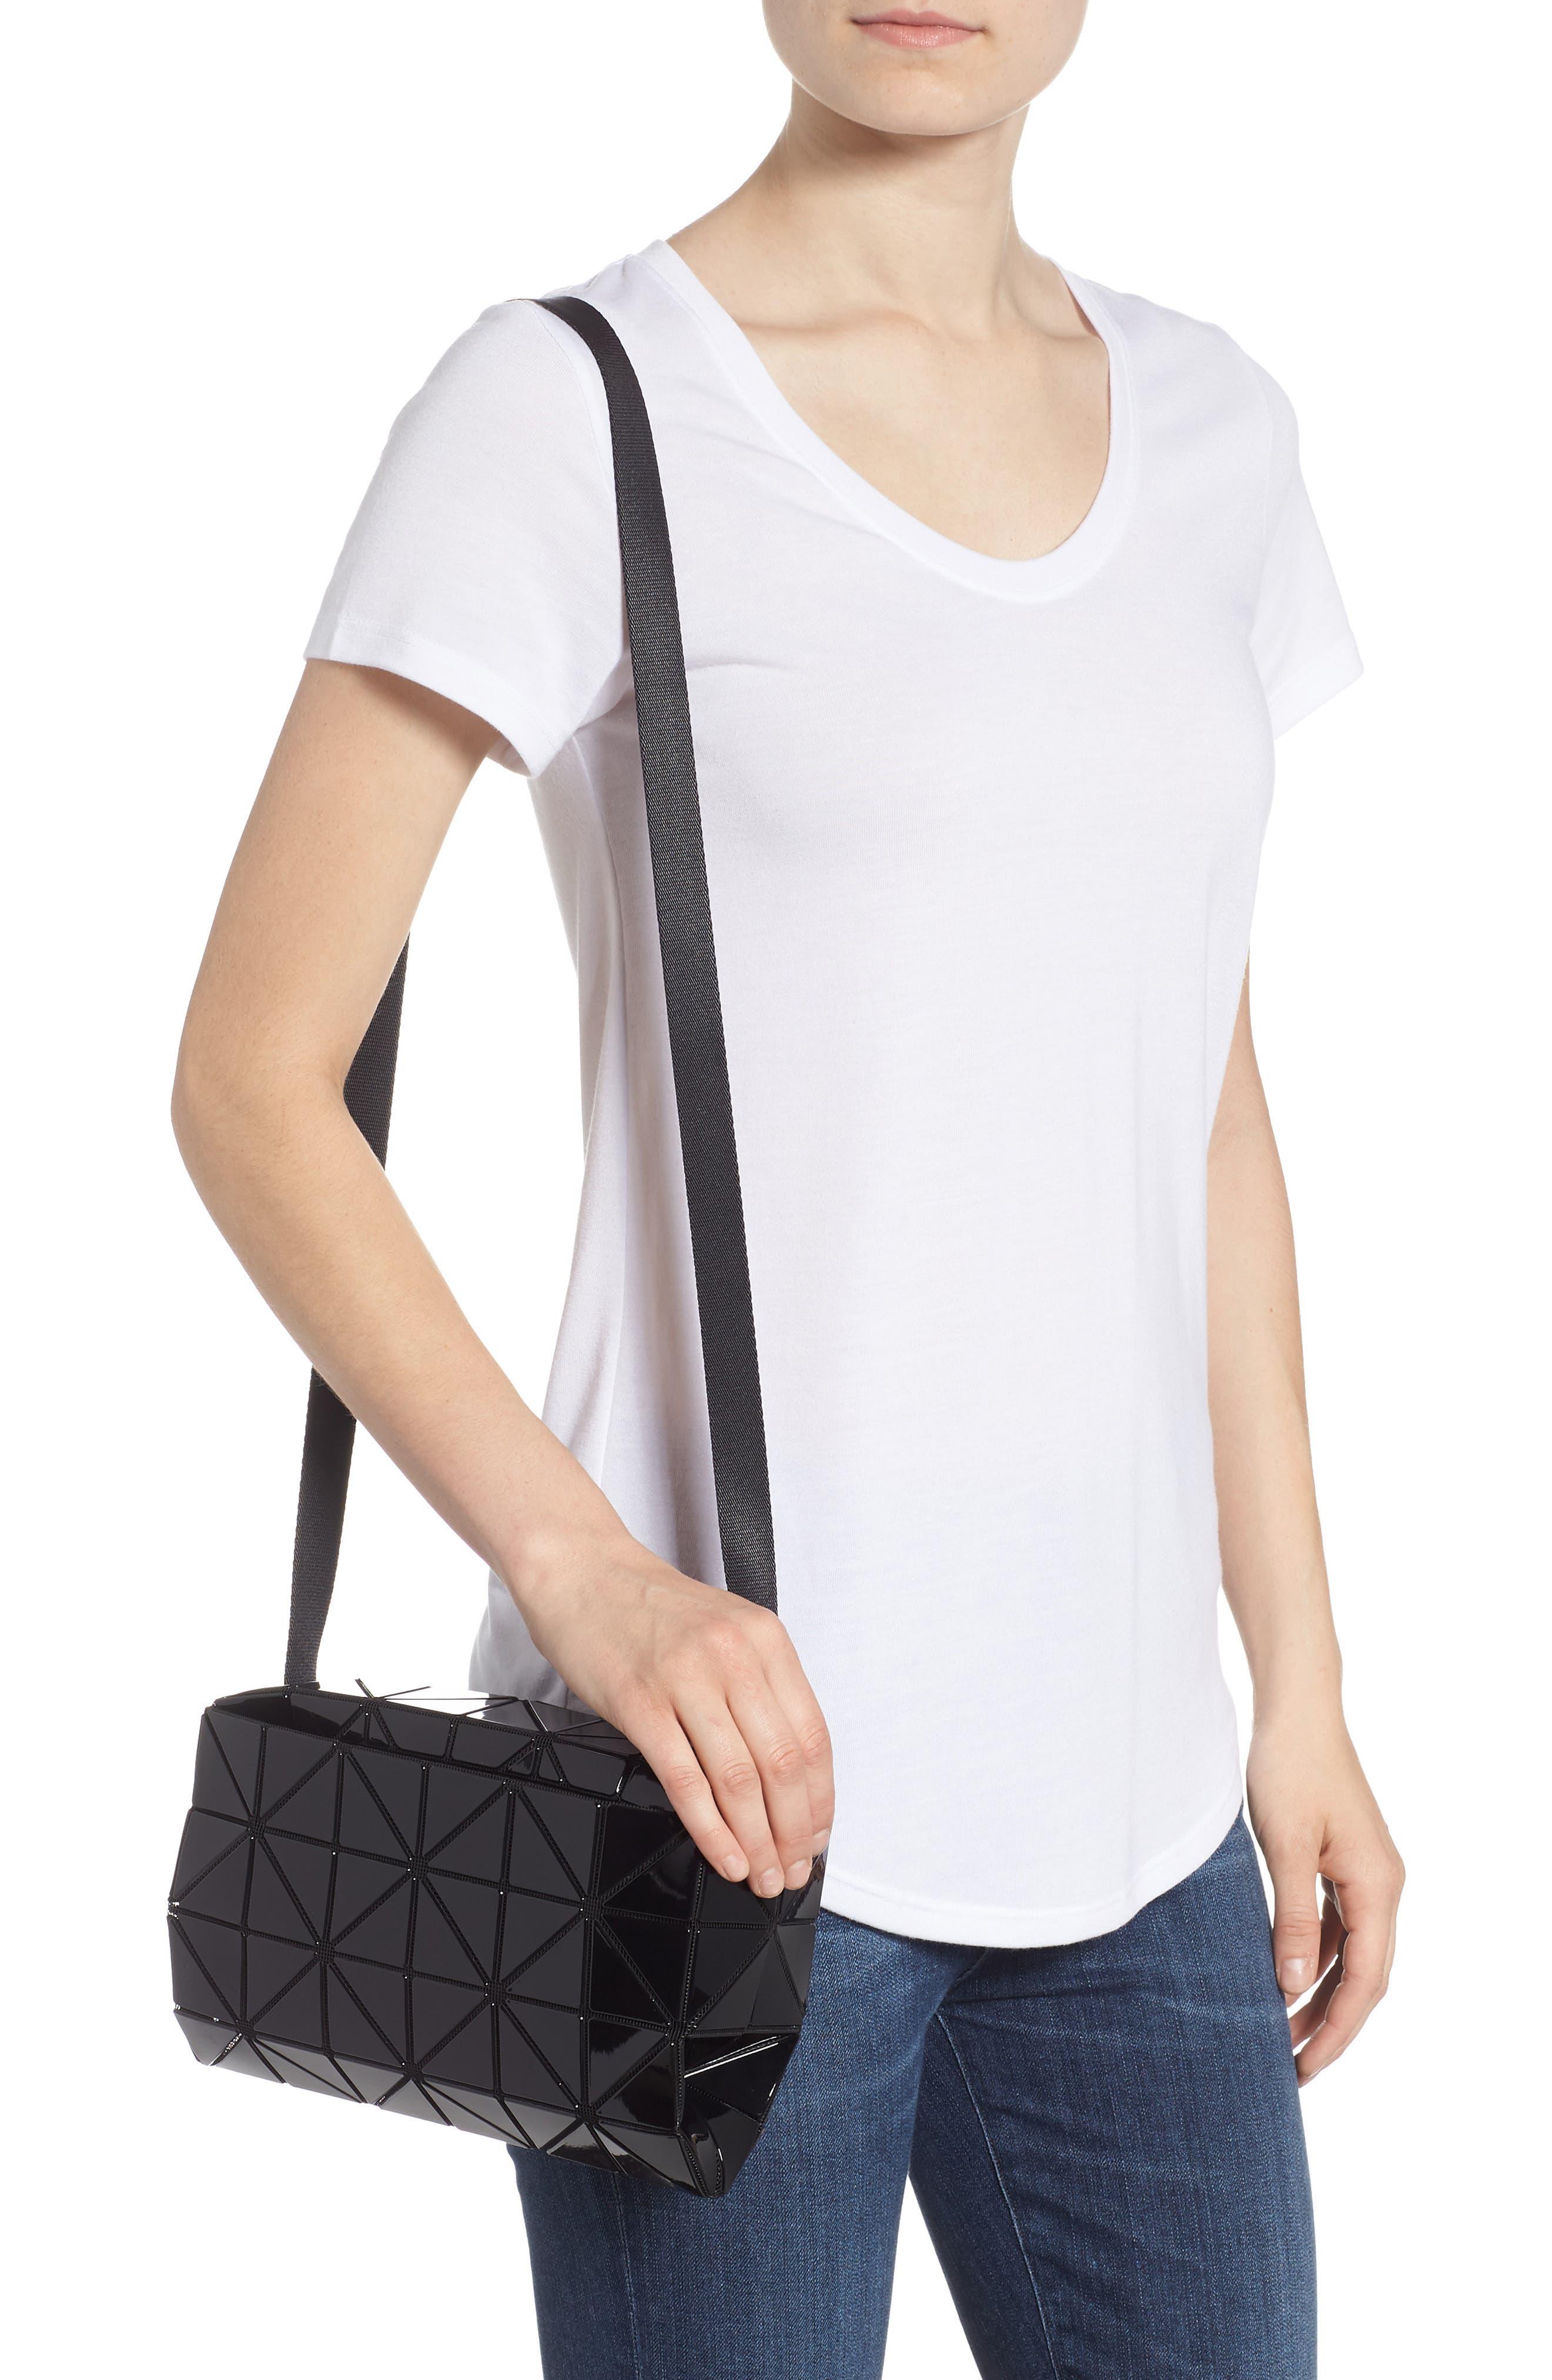 Carton Crossbody Bag,                             Alternate thumbnail 2, color,                             BLACK